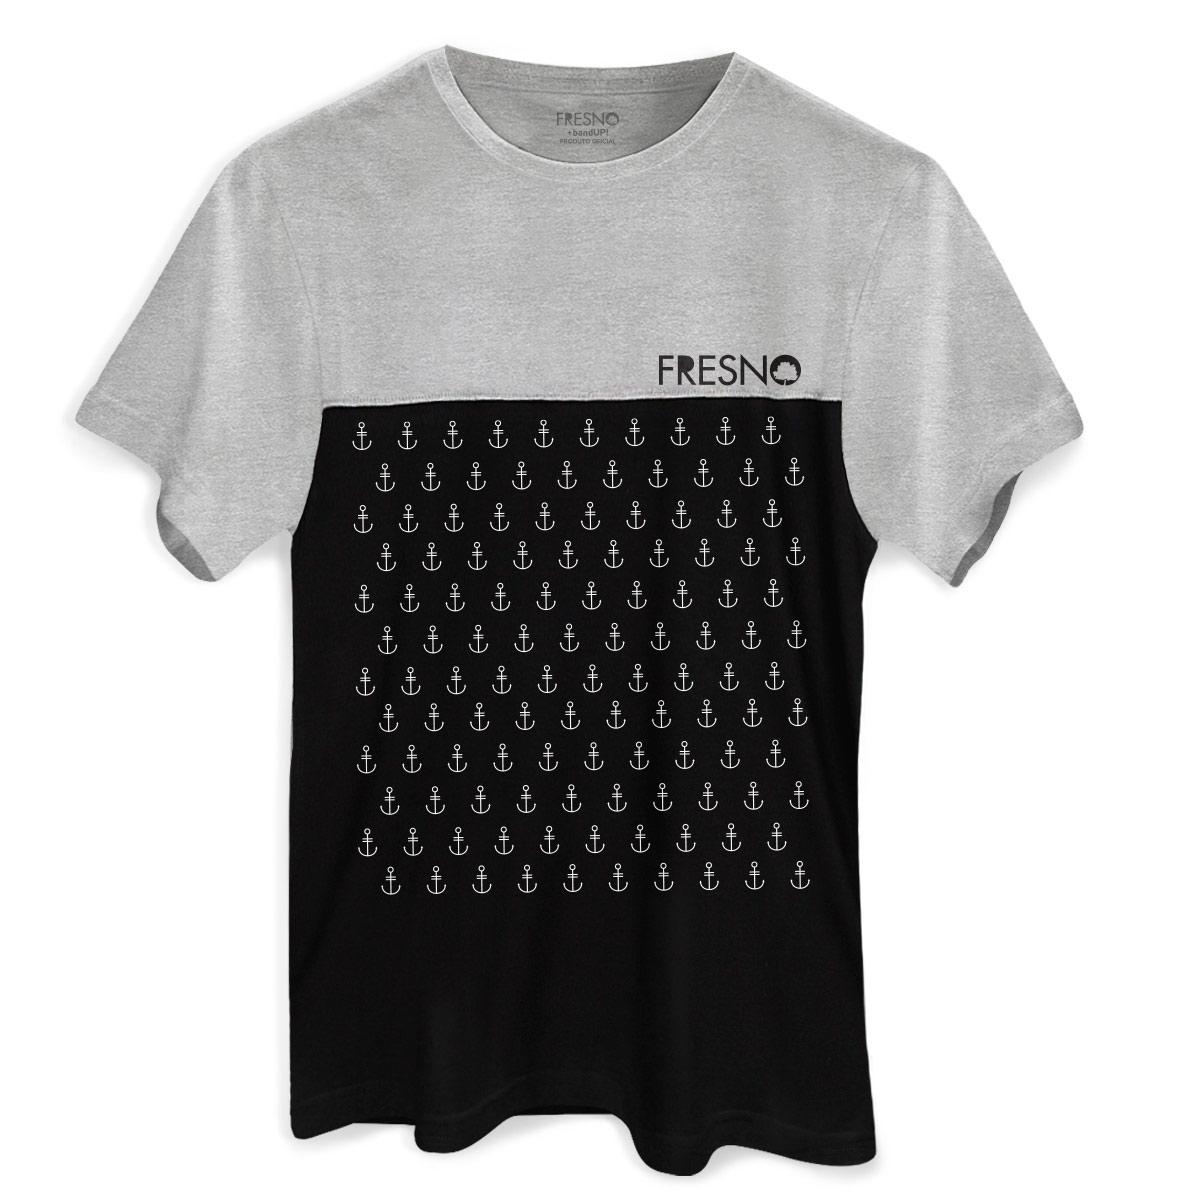 Camiseta Masculina Bicolor Fresno Âncoras